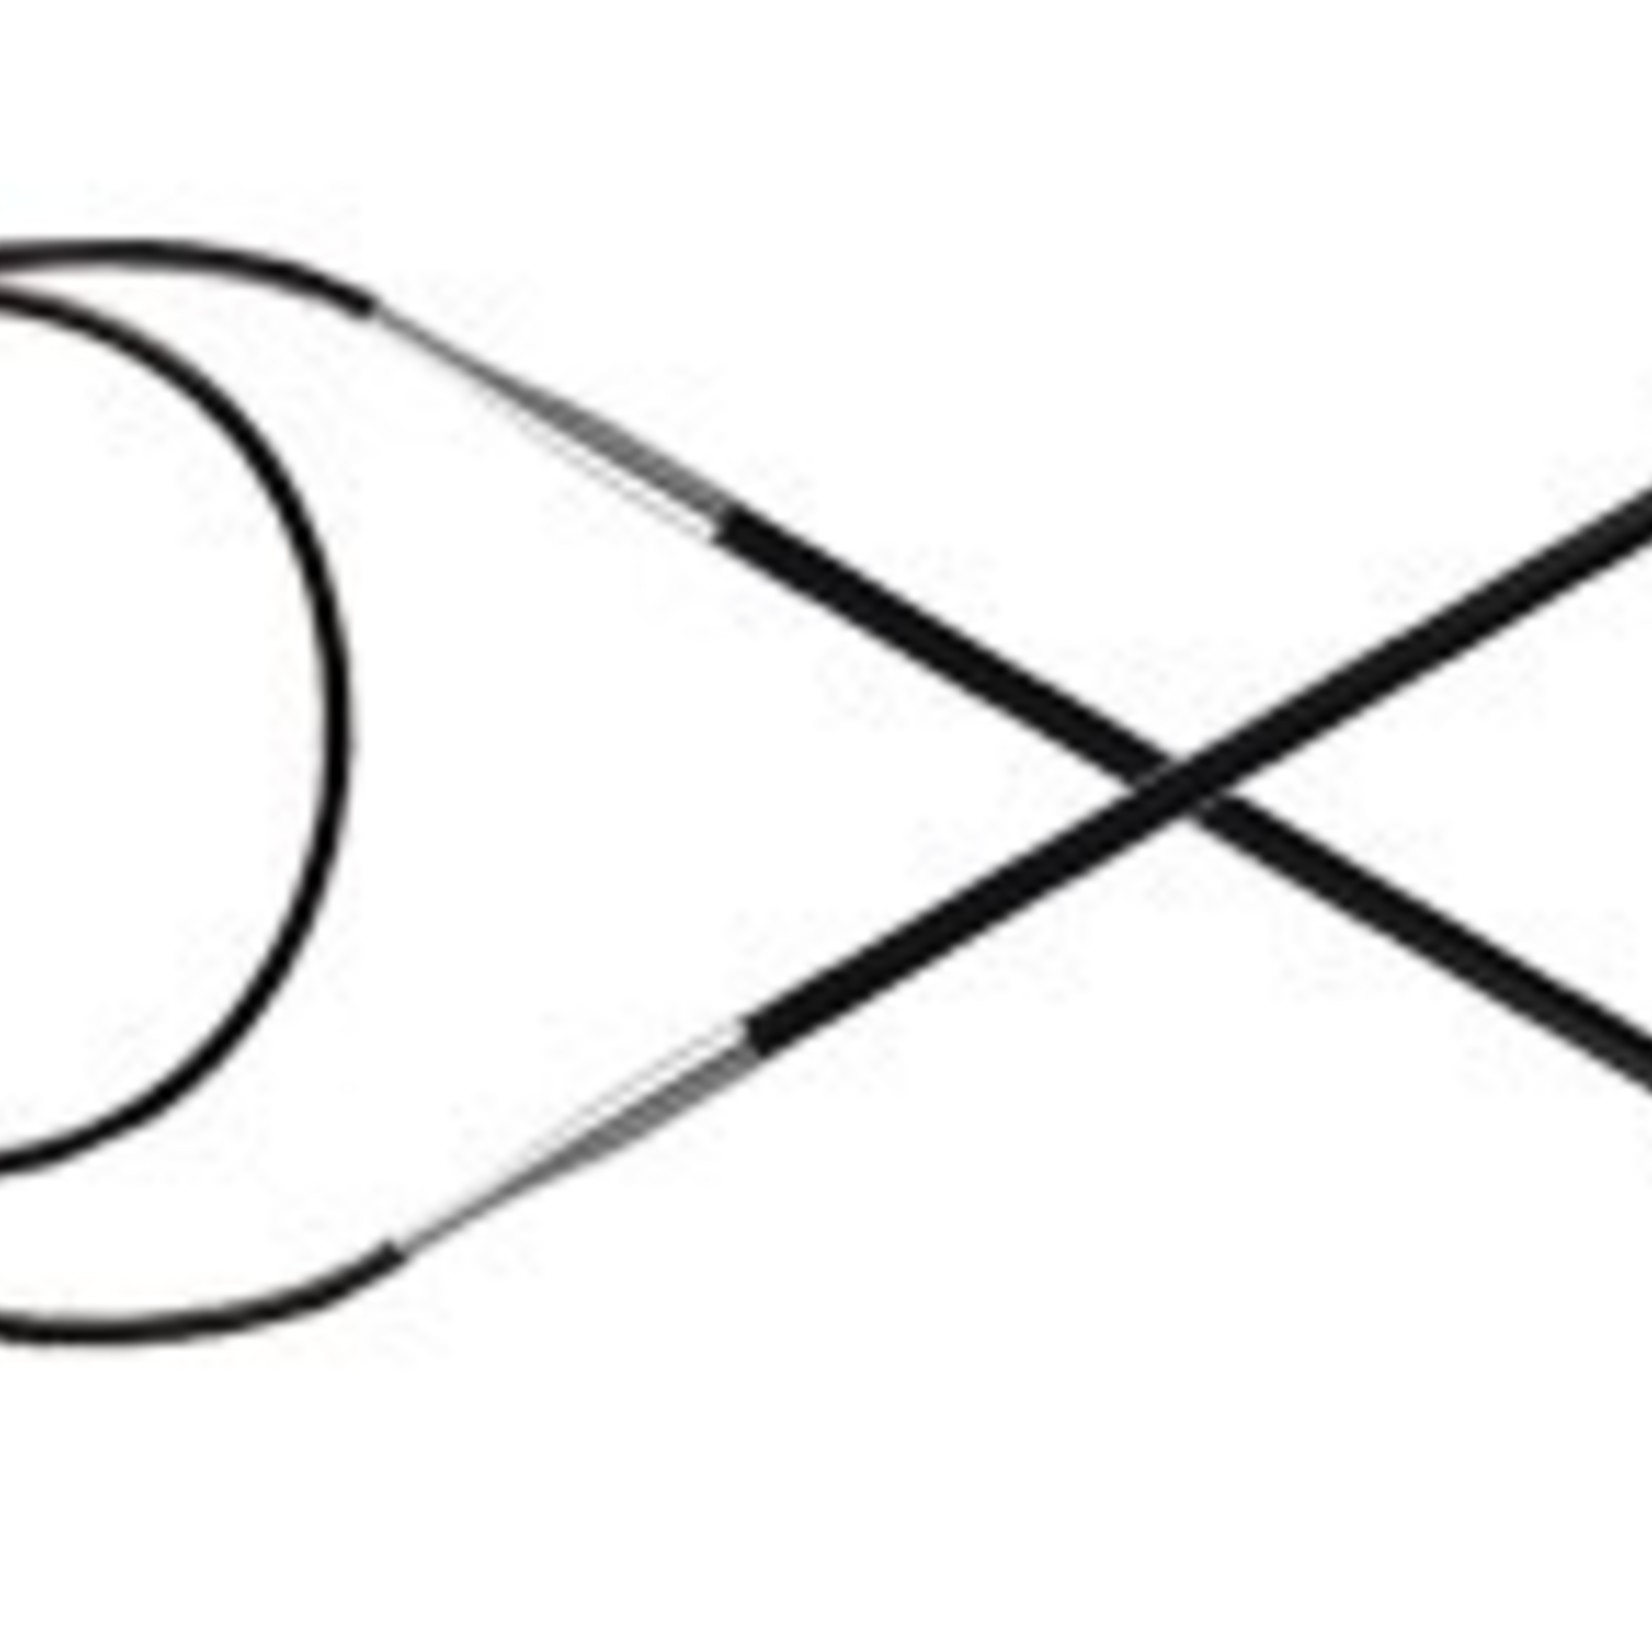 Knitter's Pride 9 Karbonz Circular 24